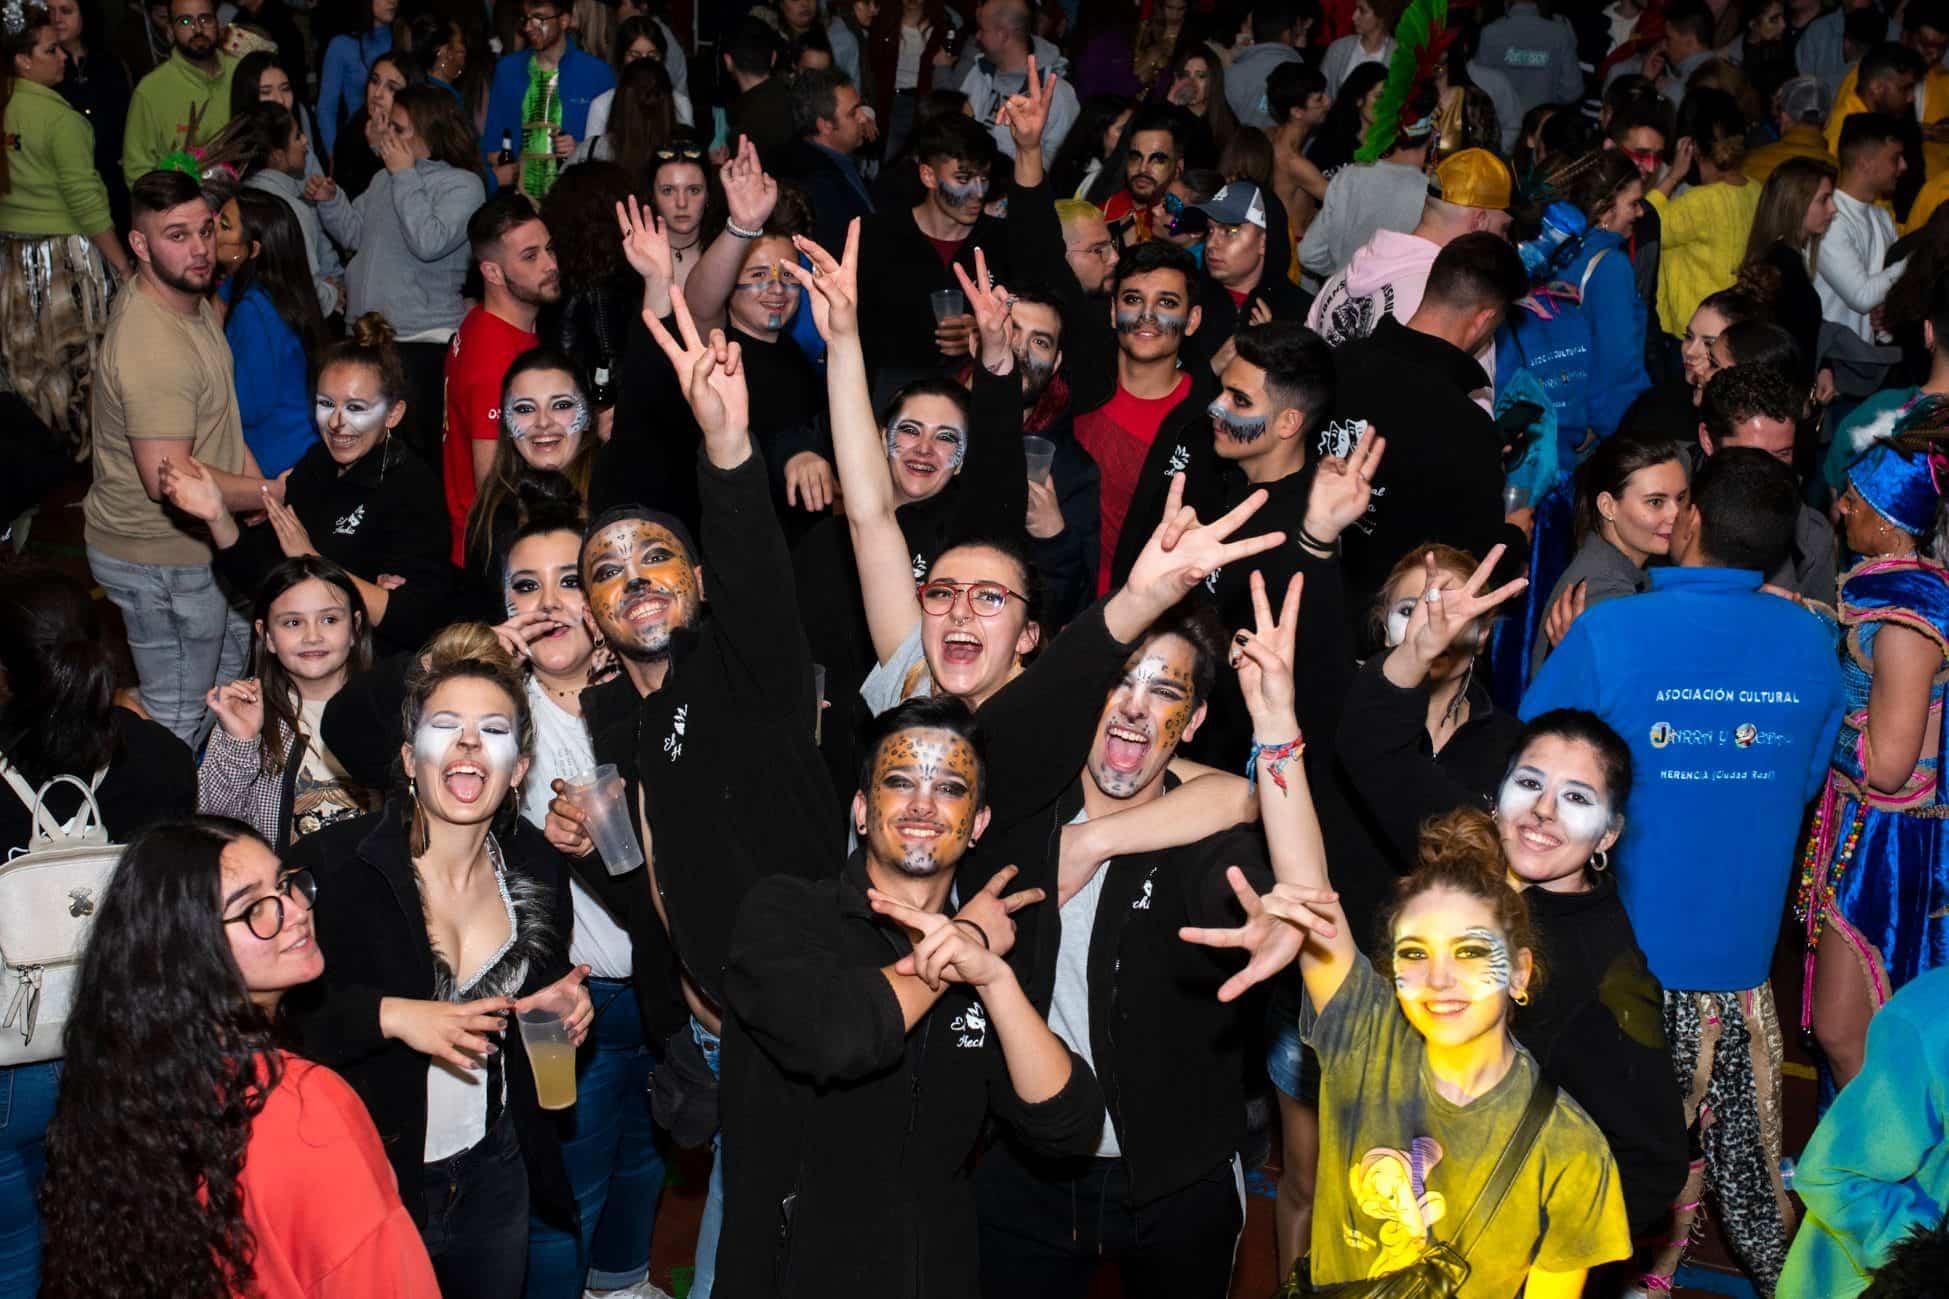 Carnaval de herencia 2020 ofertorio 146 - Selección de fotografías del Ofertorio del Carnaval de Herencia